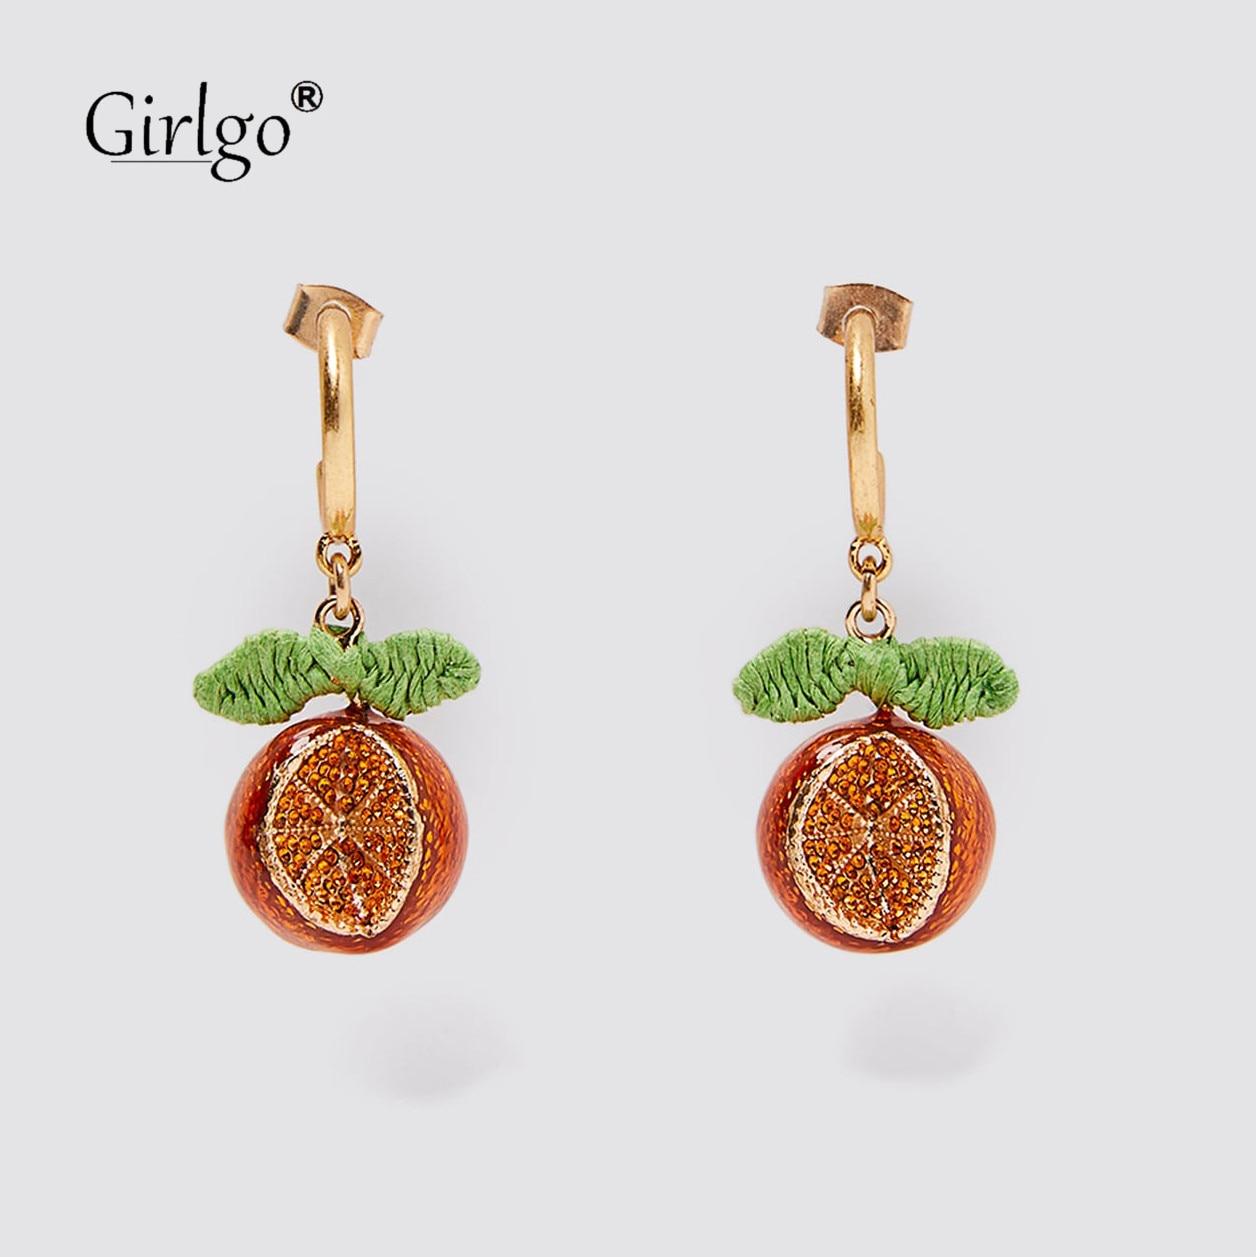 Girlgo Special Za Orange Dangle Drop Earrings For Women Fruit Statement Red Shell Fish Hanging Earrings Colorful Stone Ear Gifts